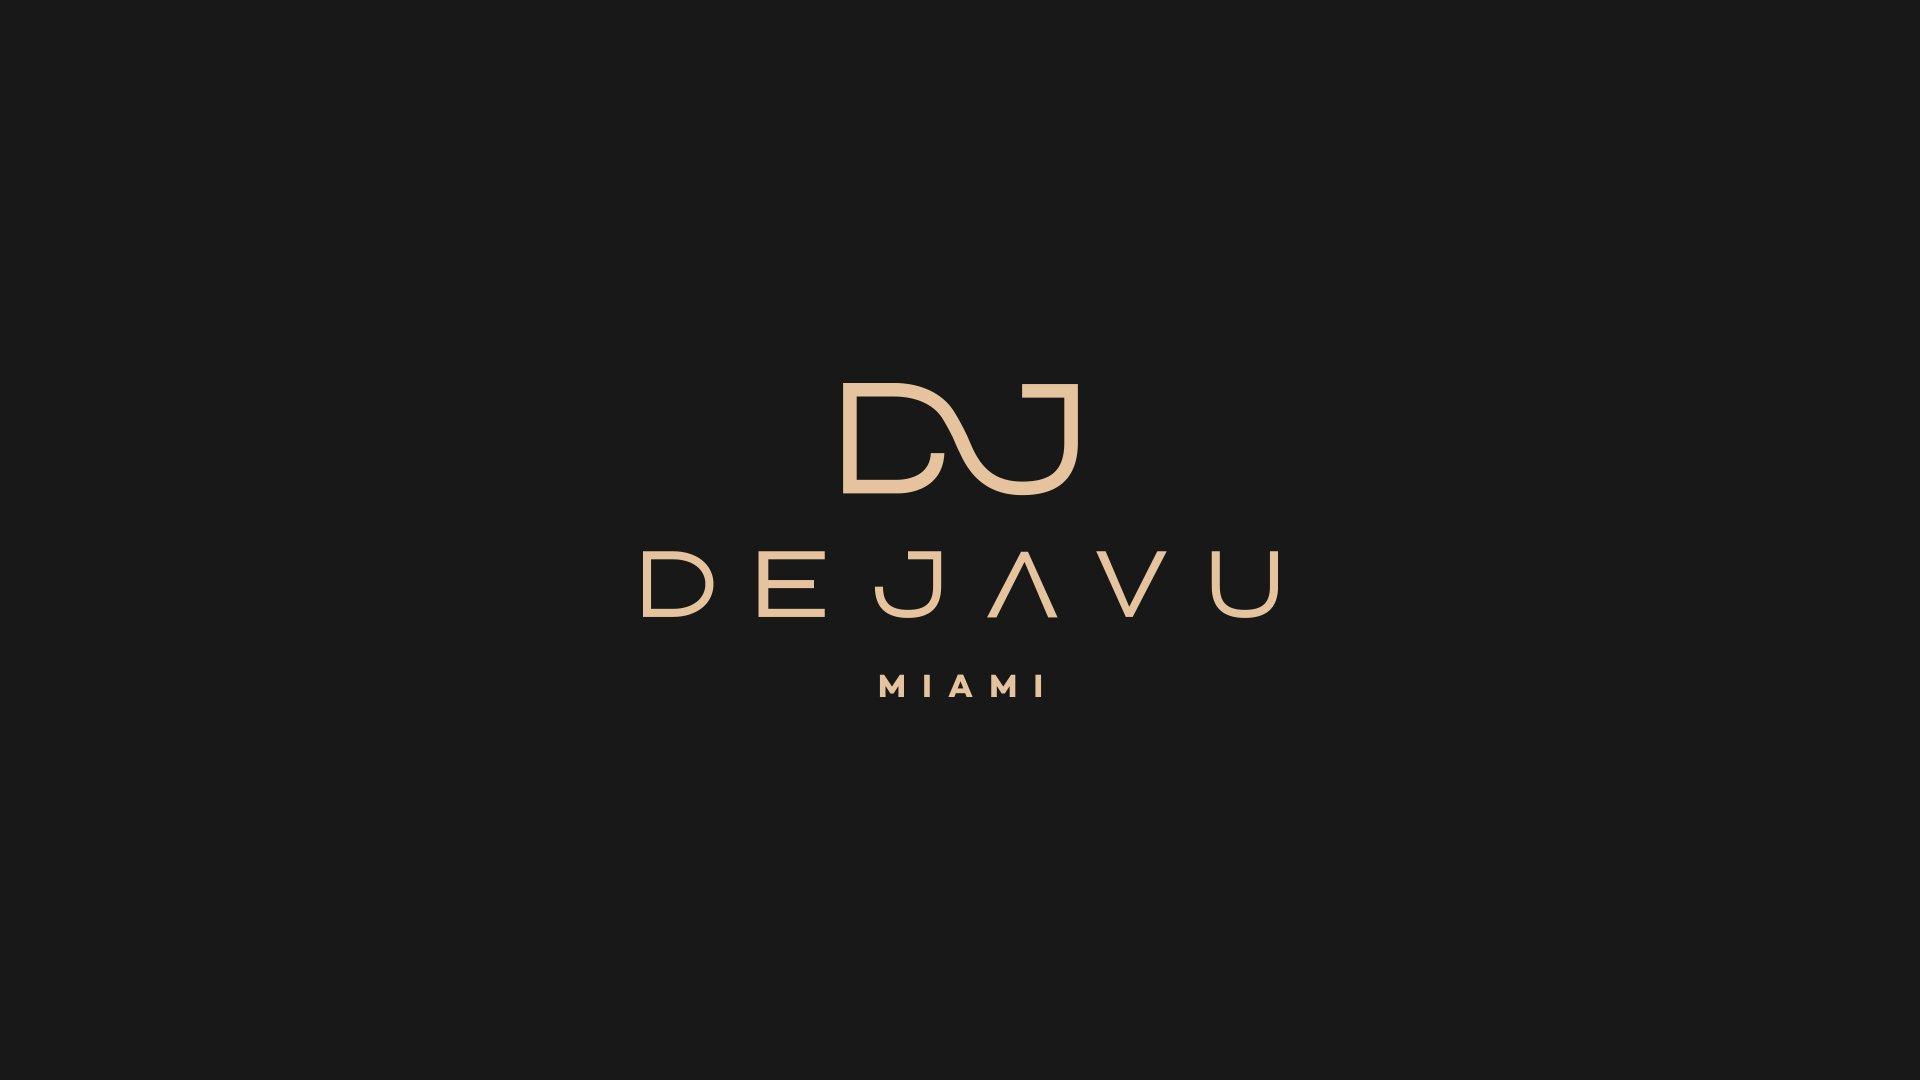 Dejavu Miami